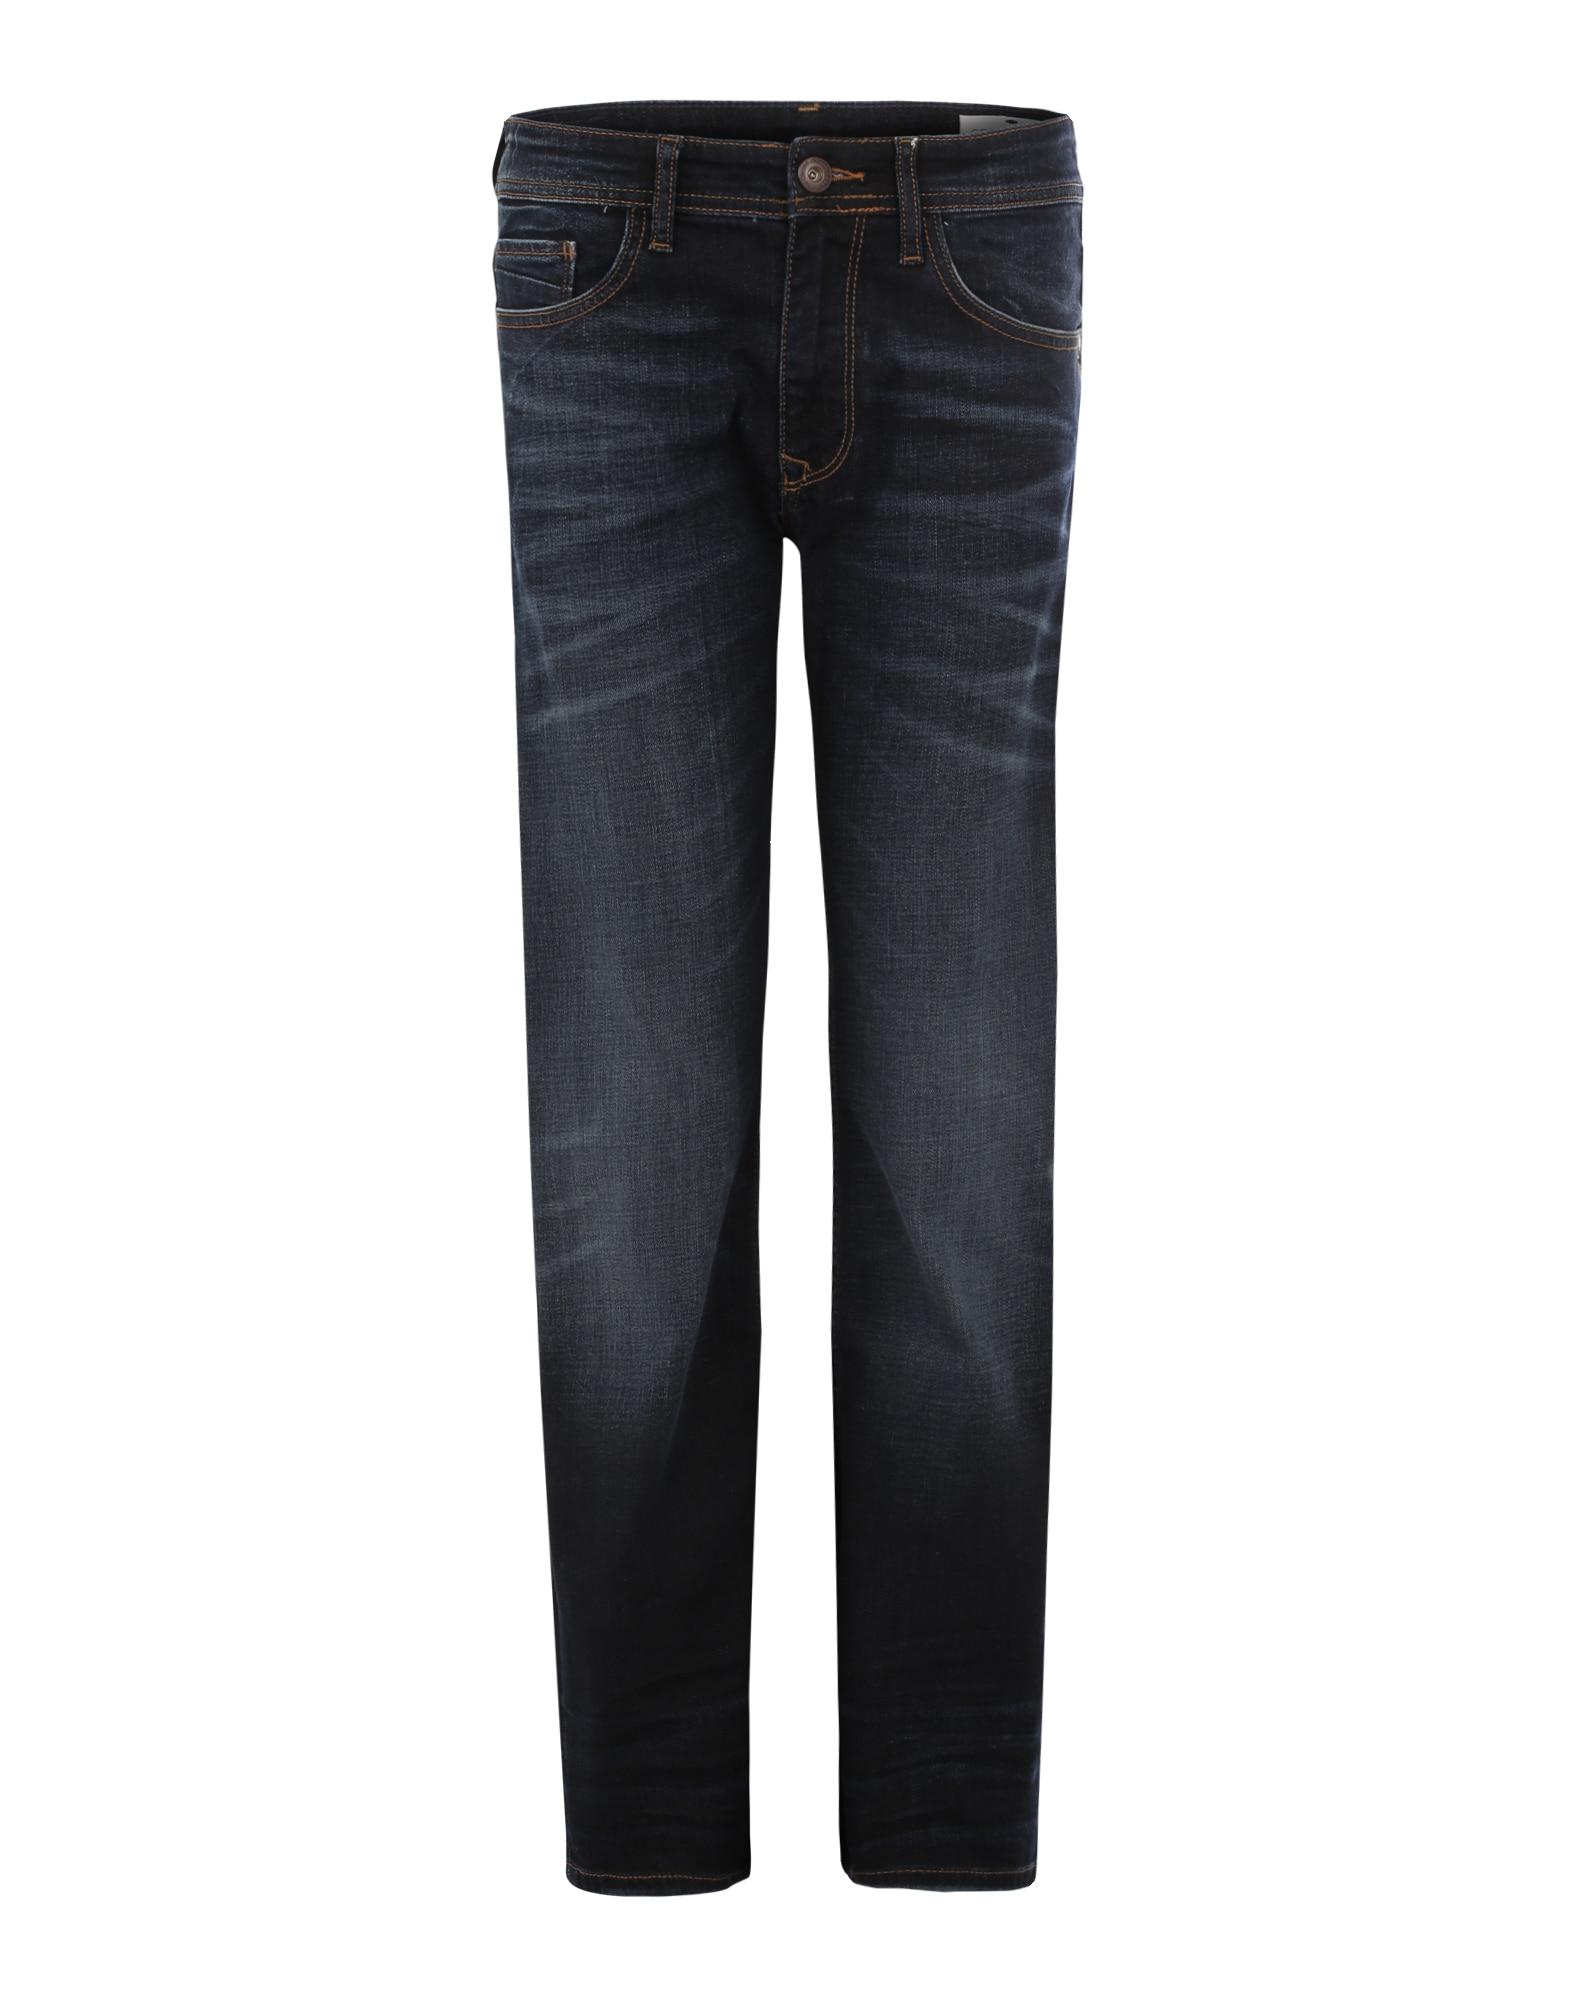 Džíny Antonio modrá džínovina Cross Jeans